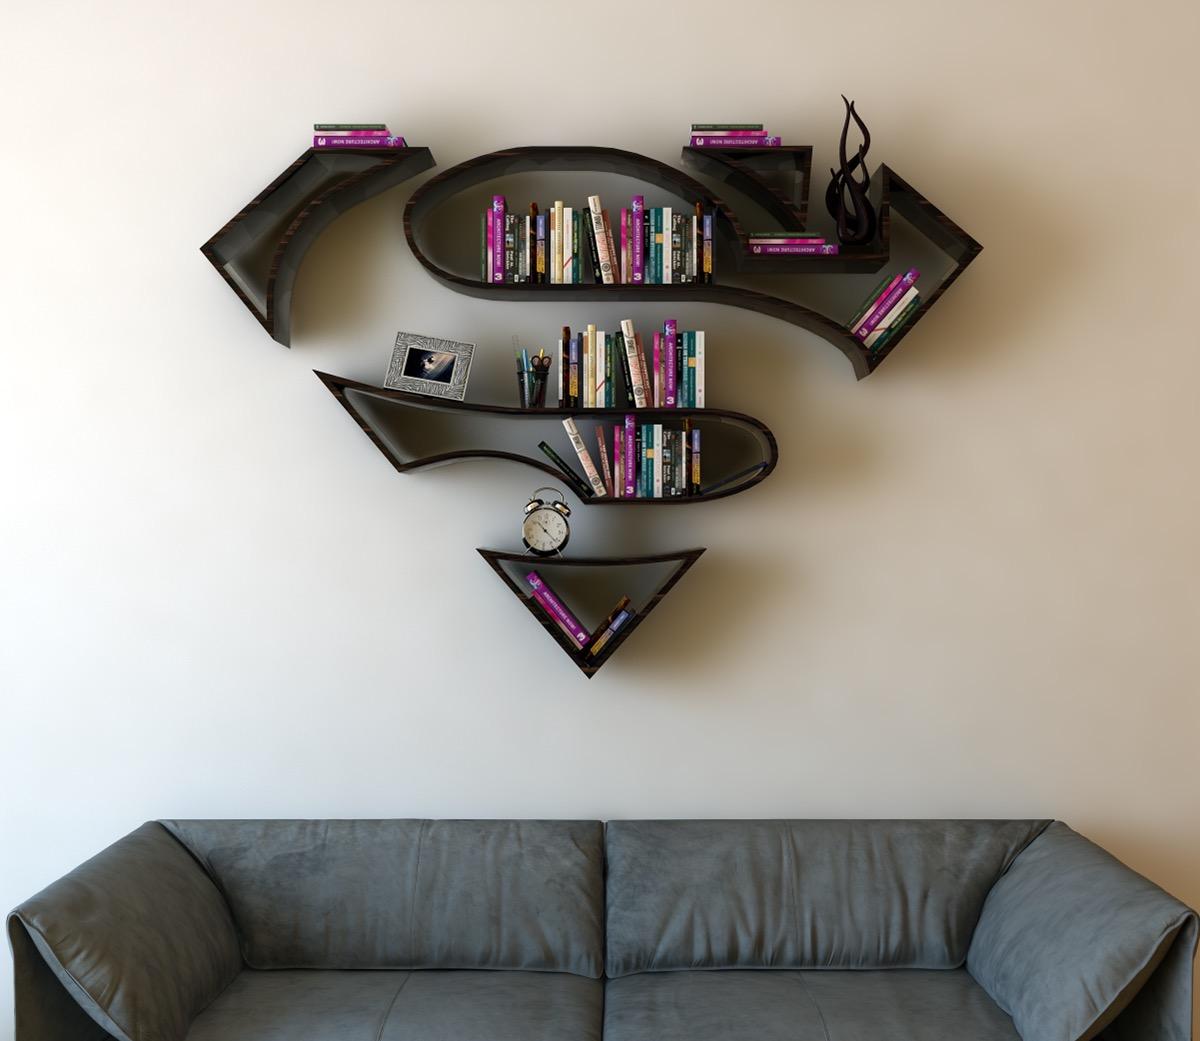 کاراکتر سوپرمن